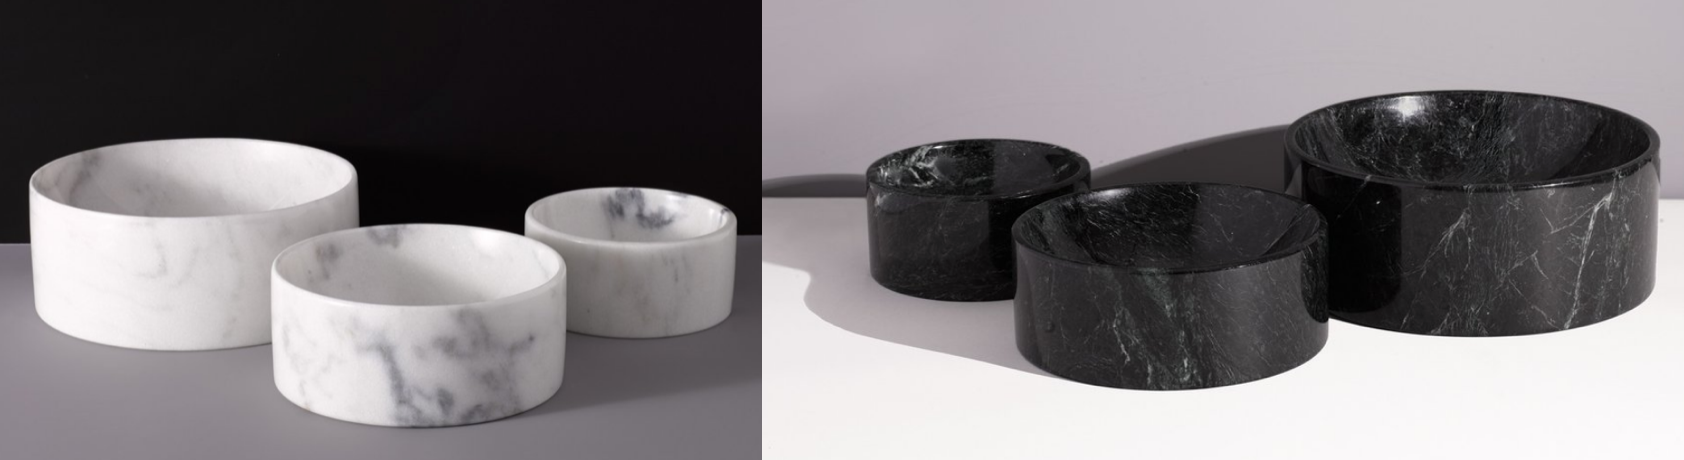 mr. dog marble dog bowls